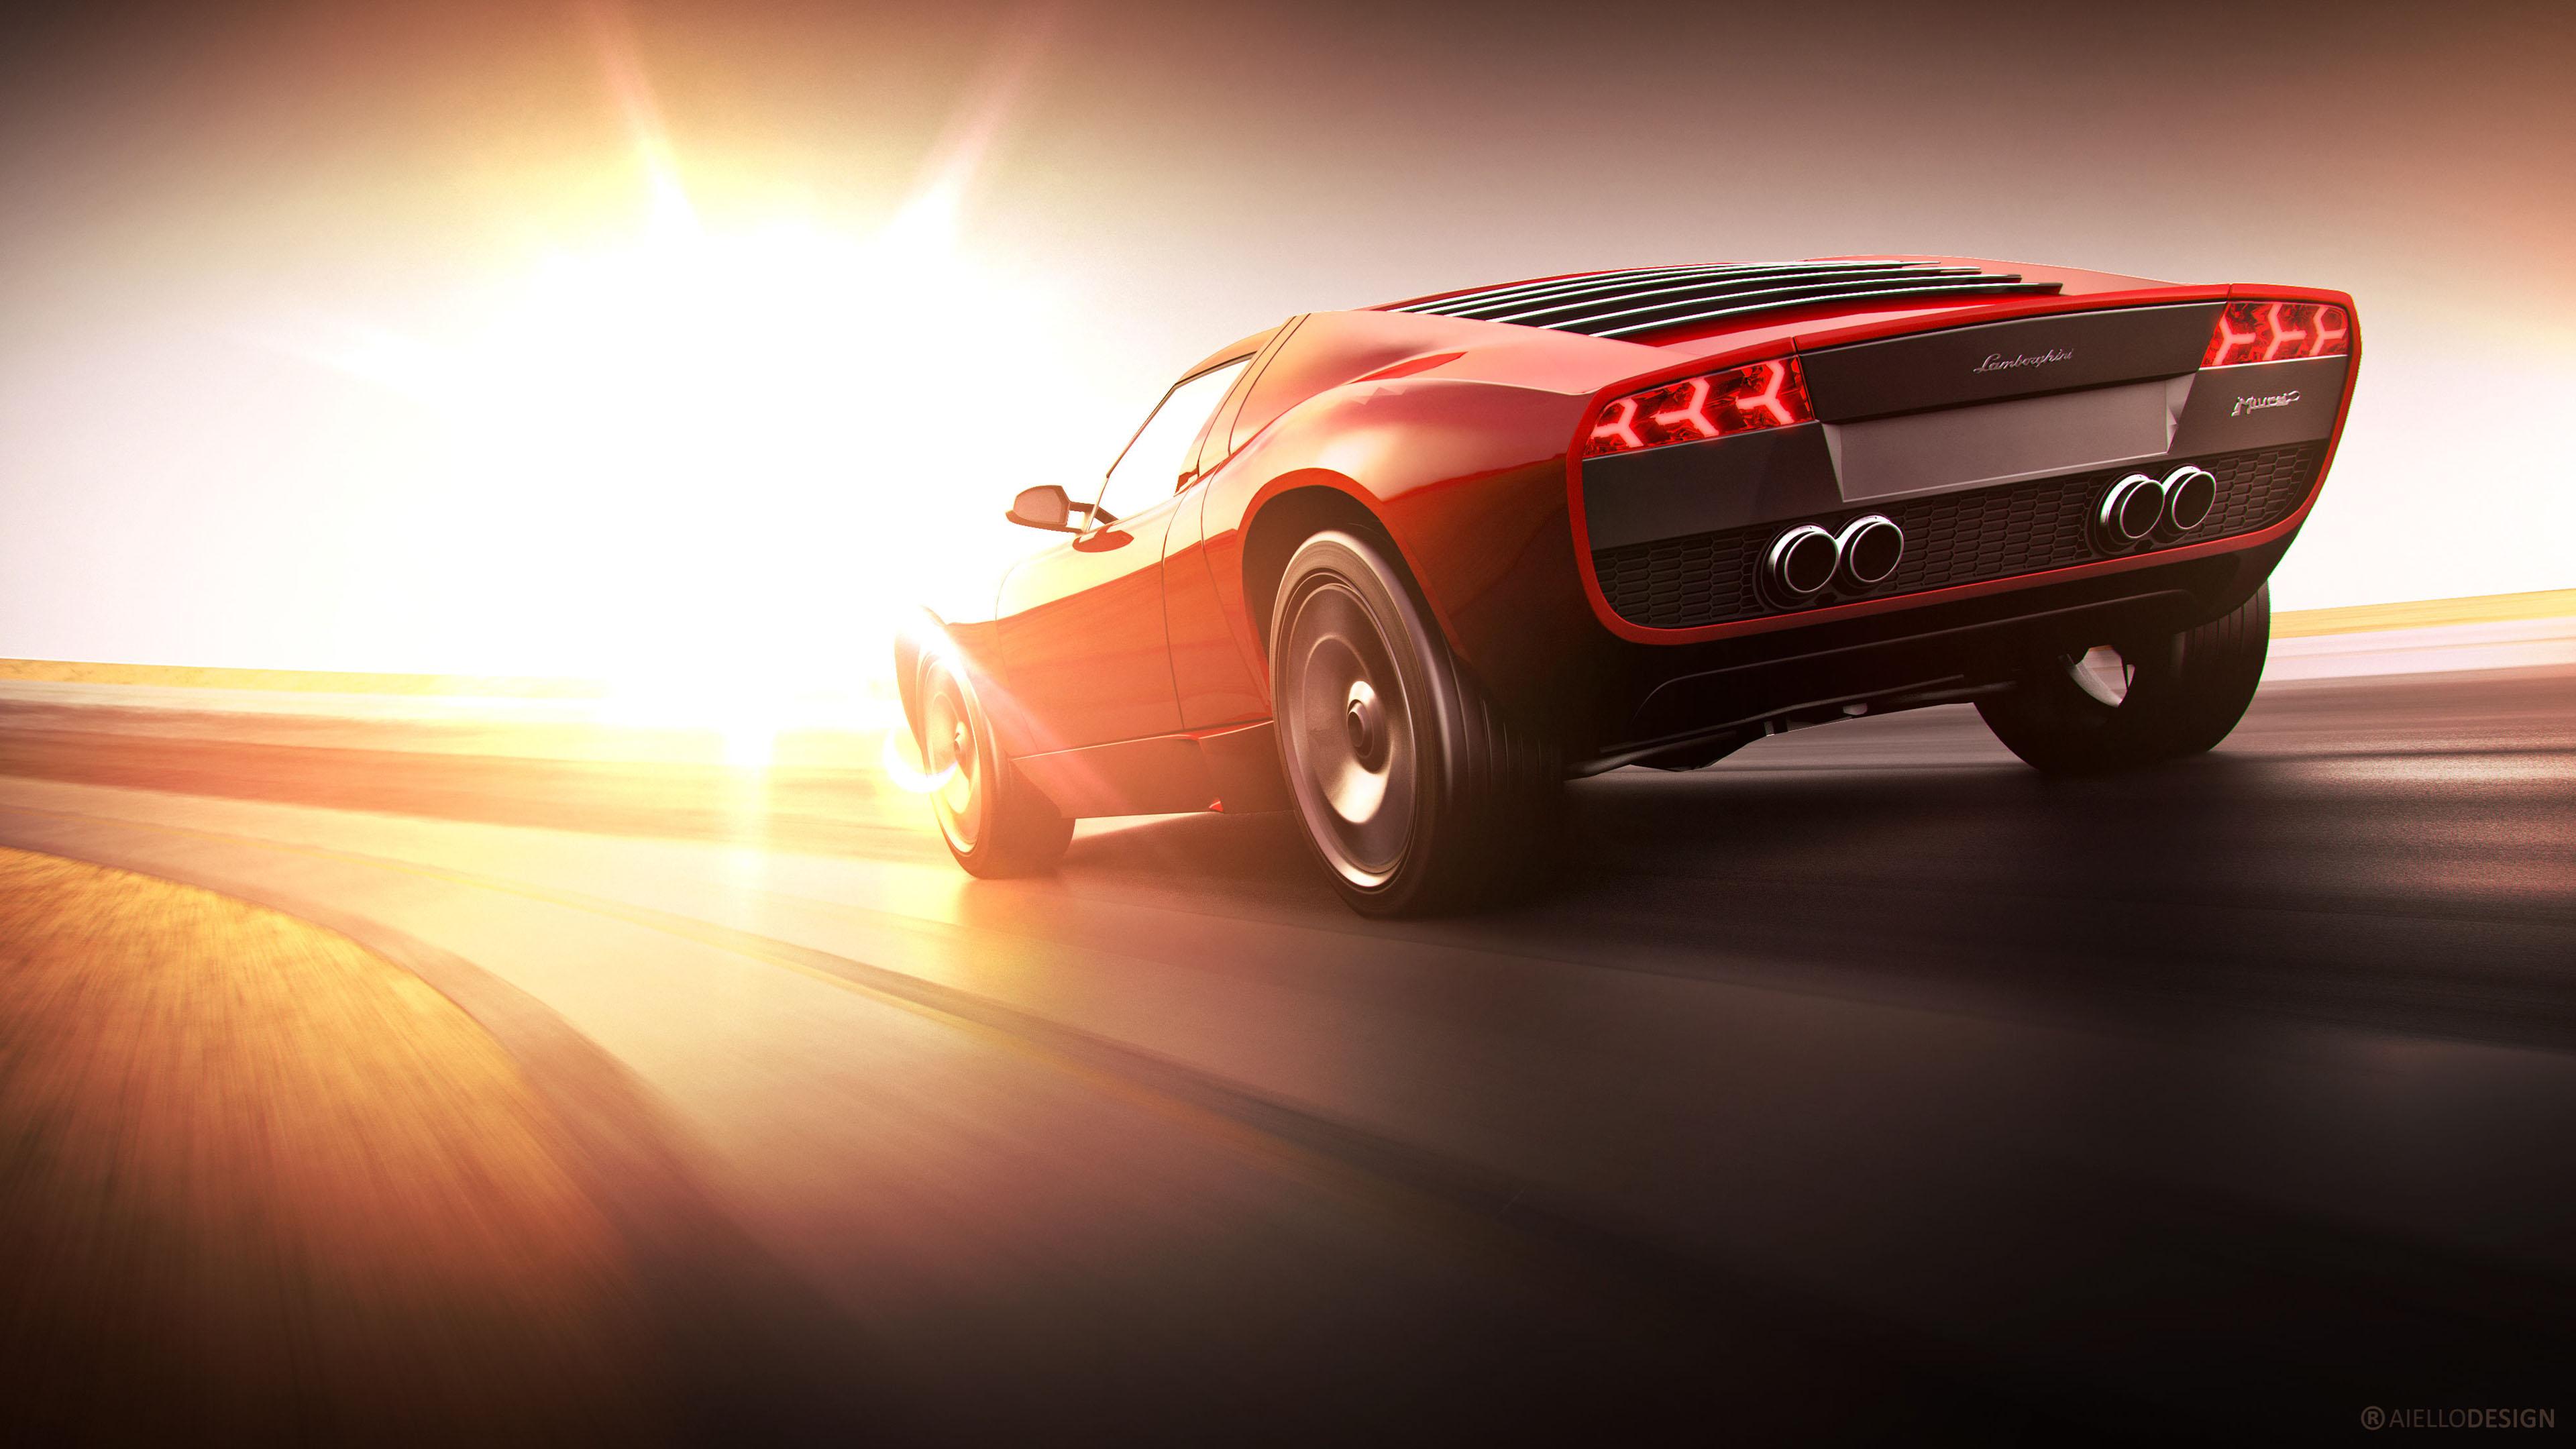 Lamborghini Racing CGI Wallpaper | HD Car Wallpapers | ID ...